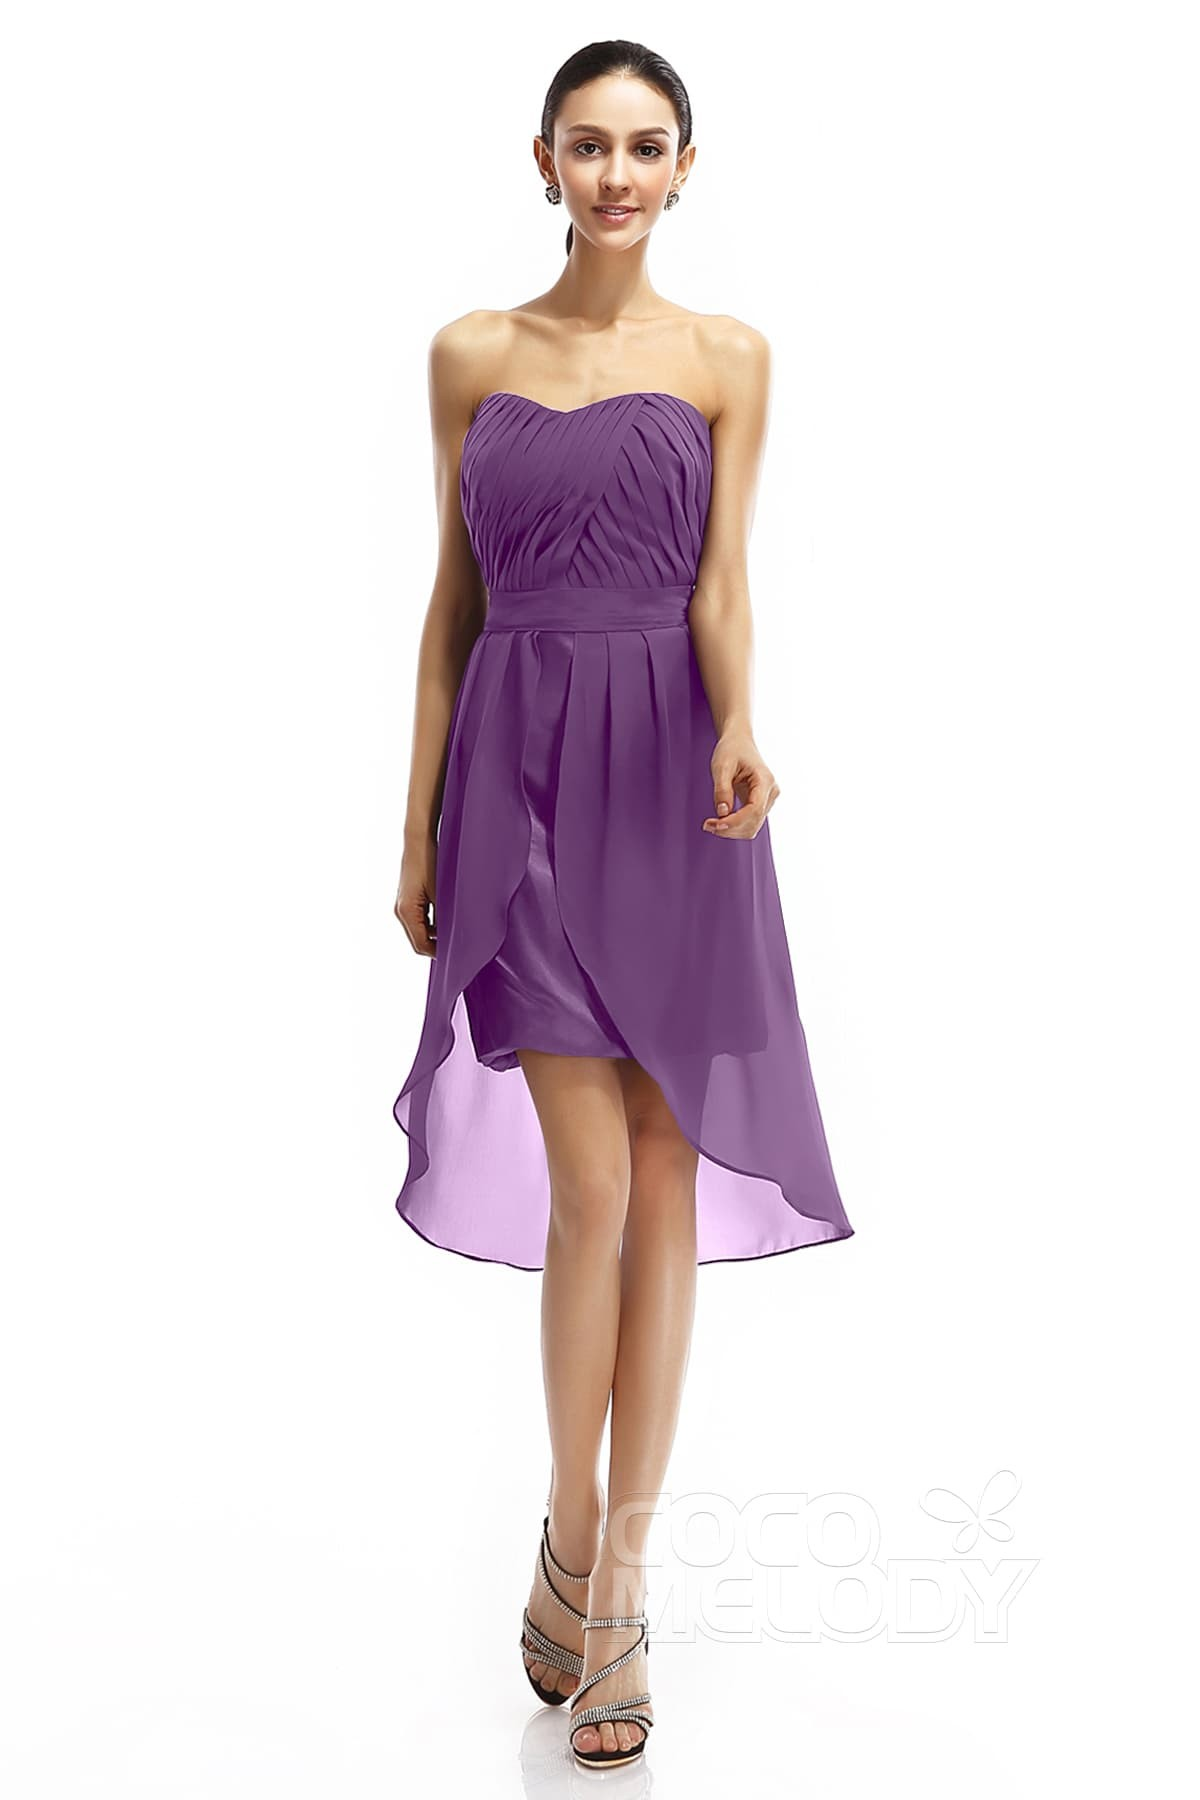 f5dcedb514fa2 Fantastic Sheath-Column Sweetheart High-Low Chiffon Sleeveless Zipper  Graduation Dresses COZM14005